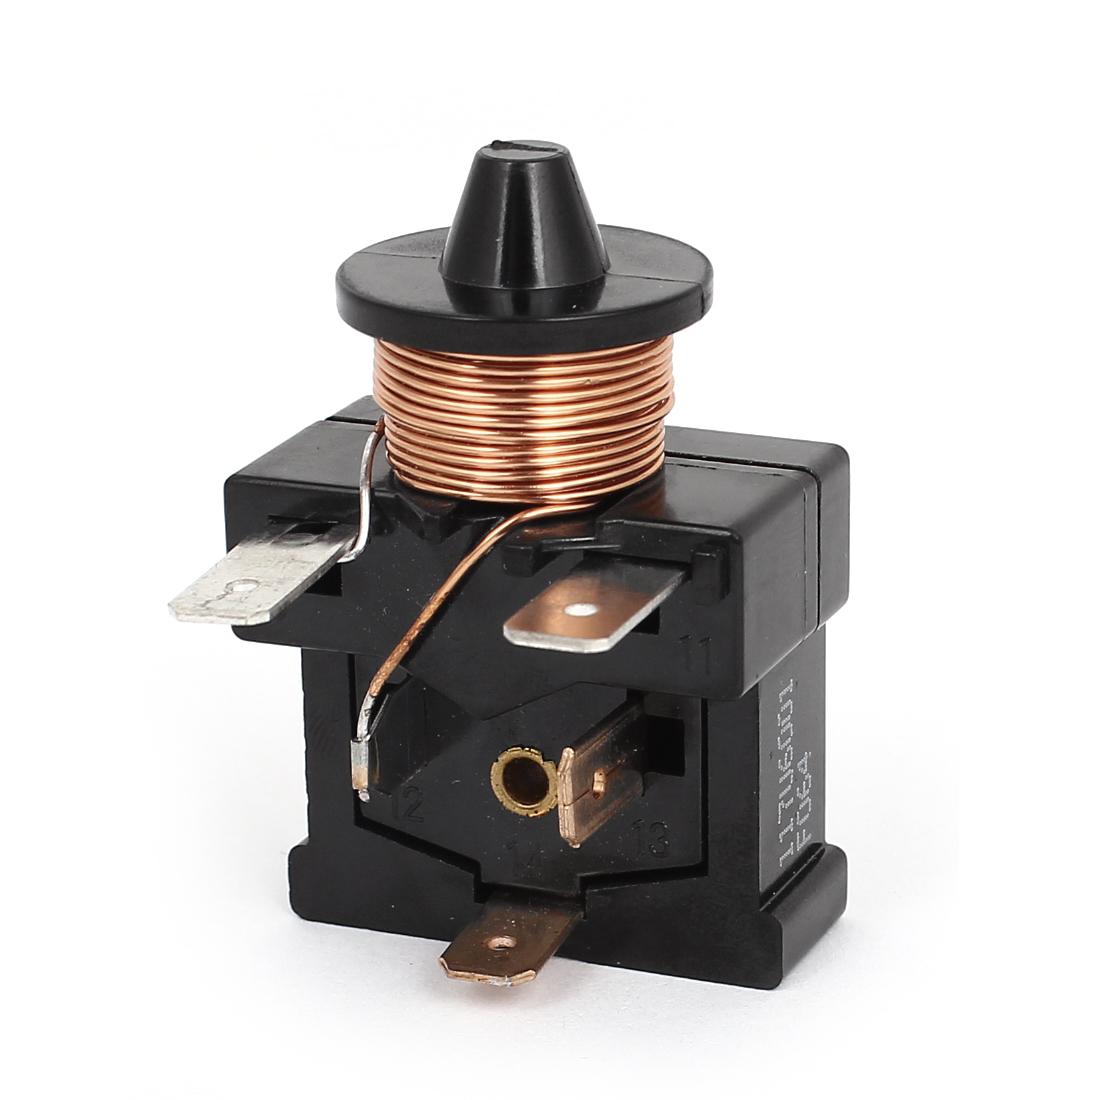 1/5HP Refrigerator Freezer Overload Thermal Protector Relay Starter Black